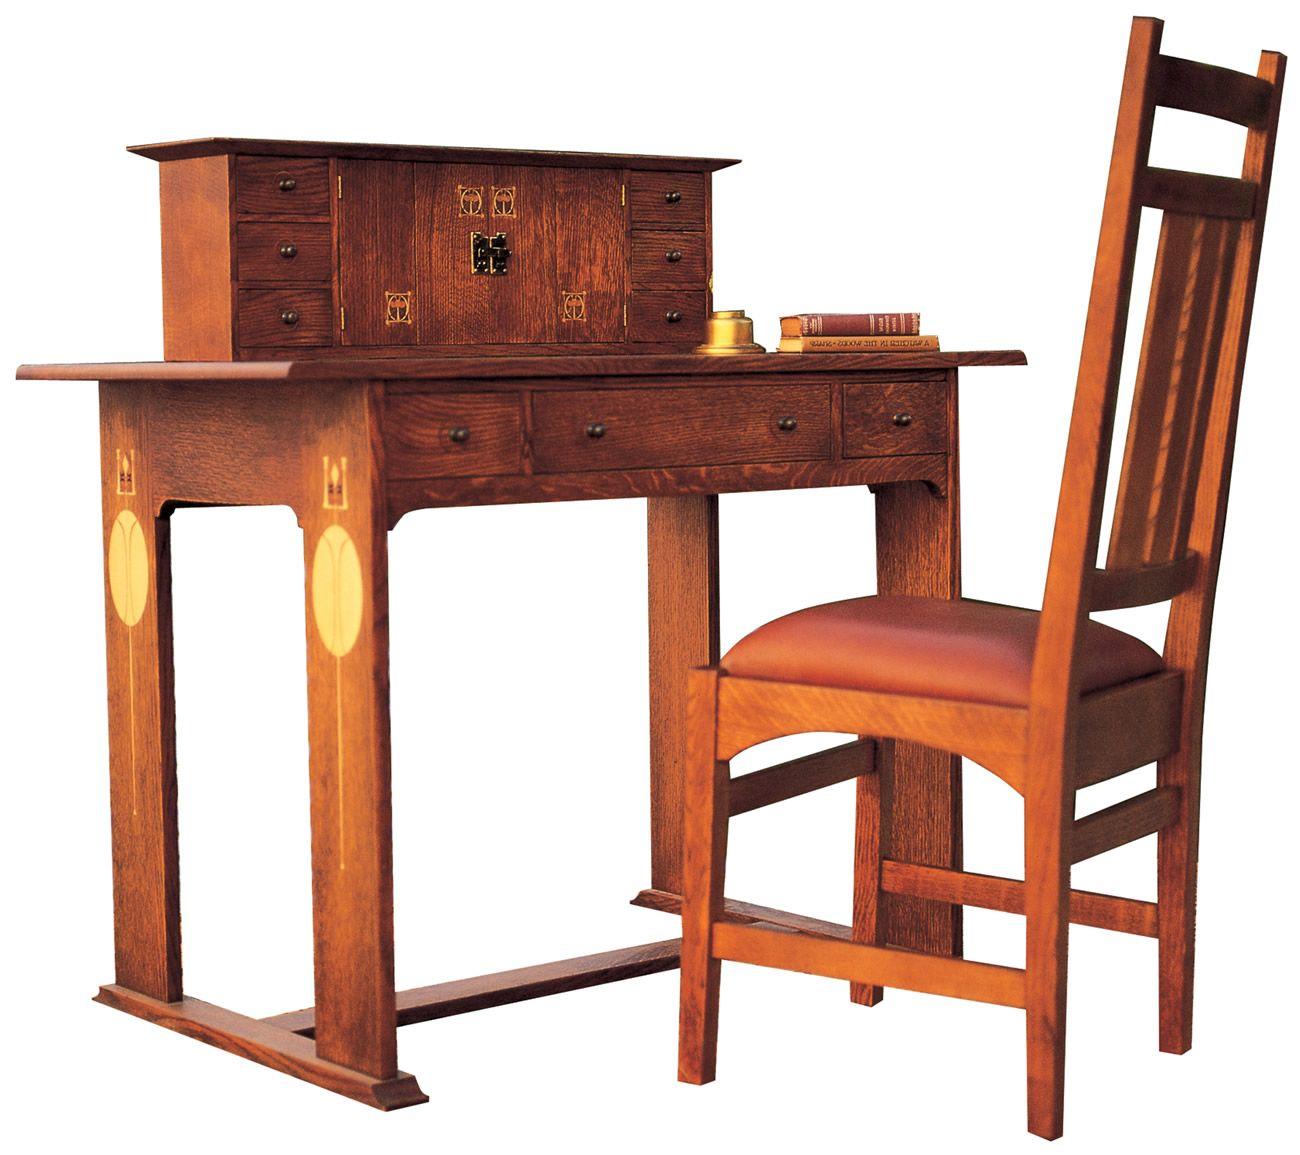 Stickley Furniture Harvey Ellis Desk & Chair with inlay